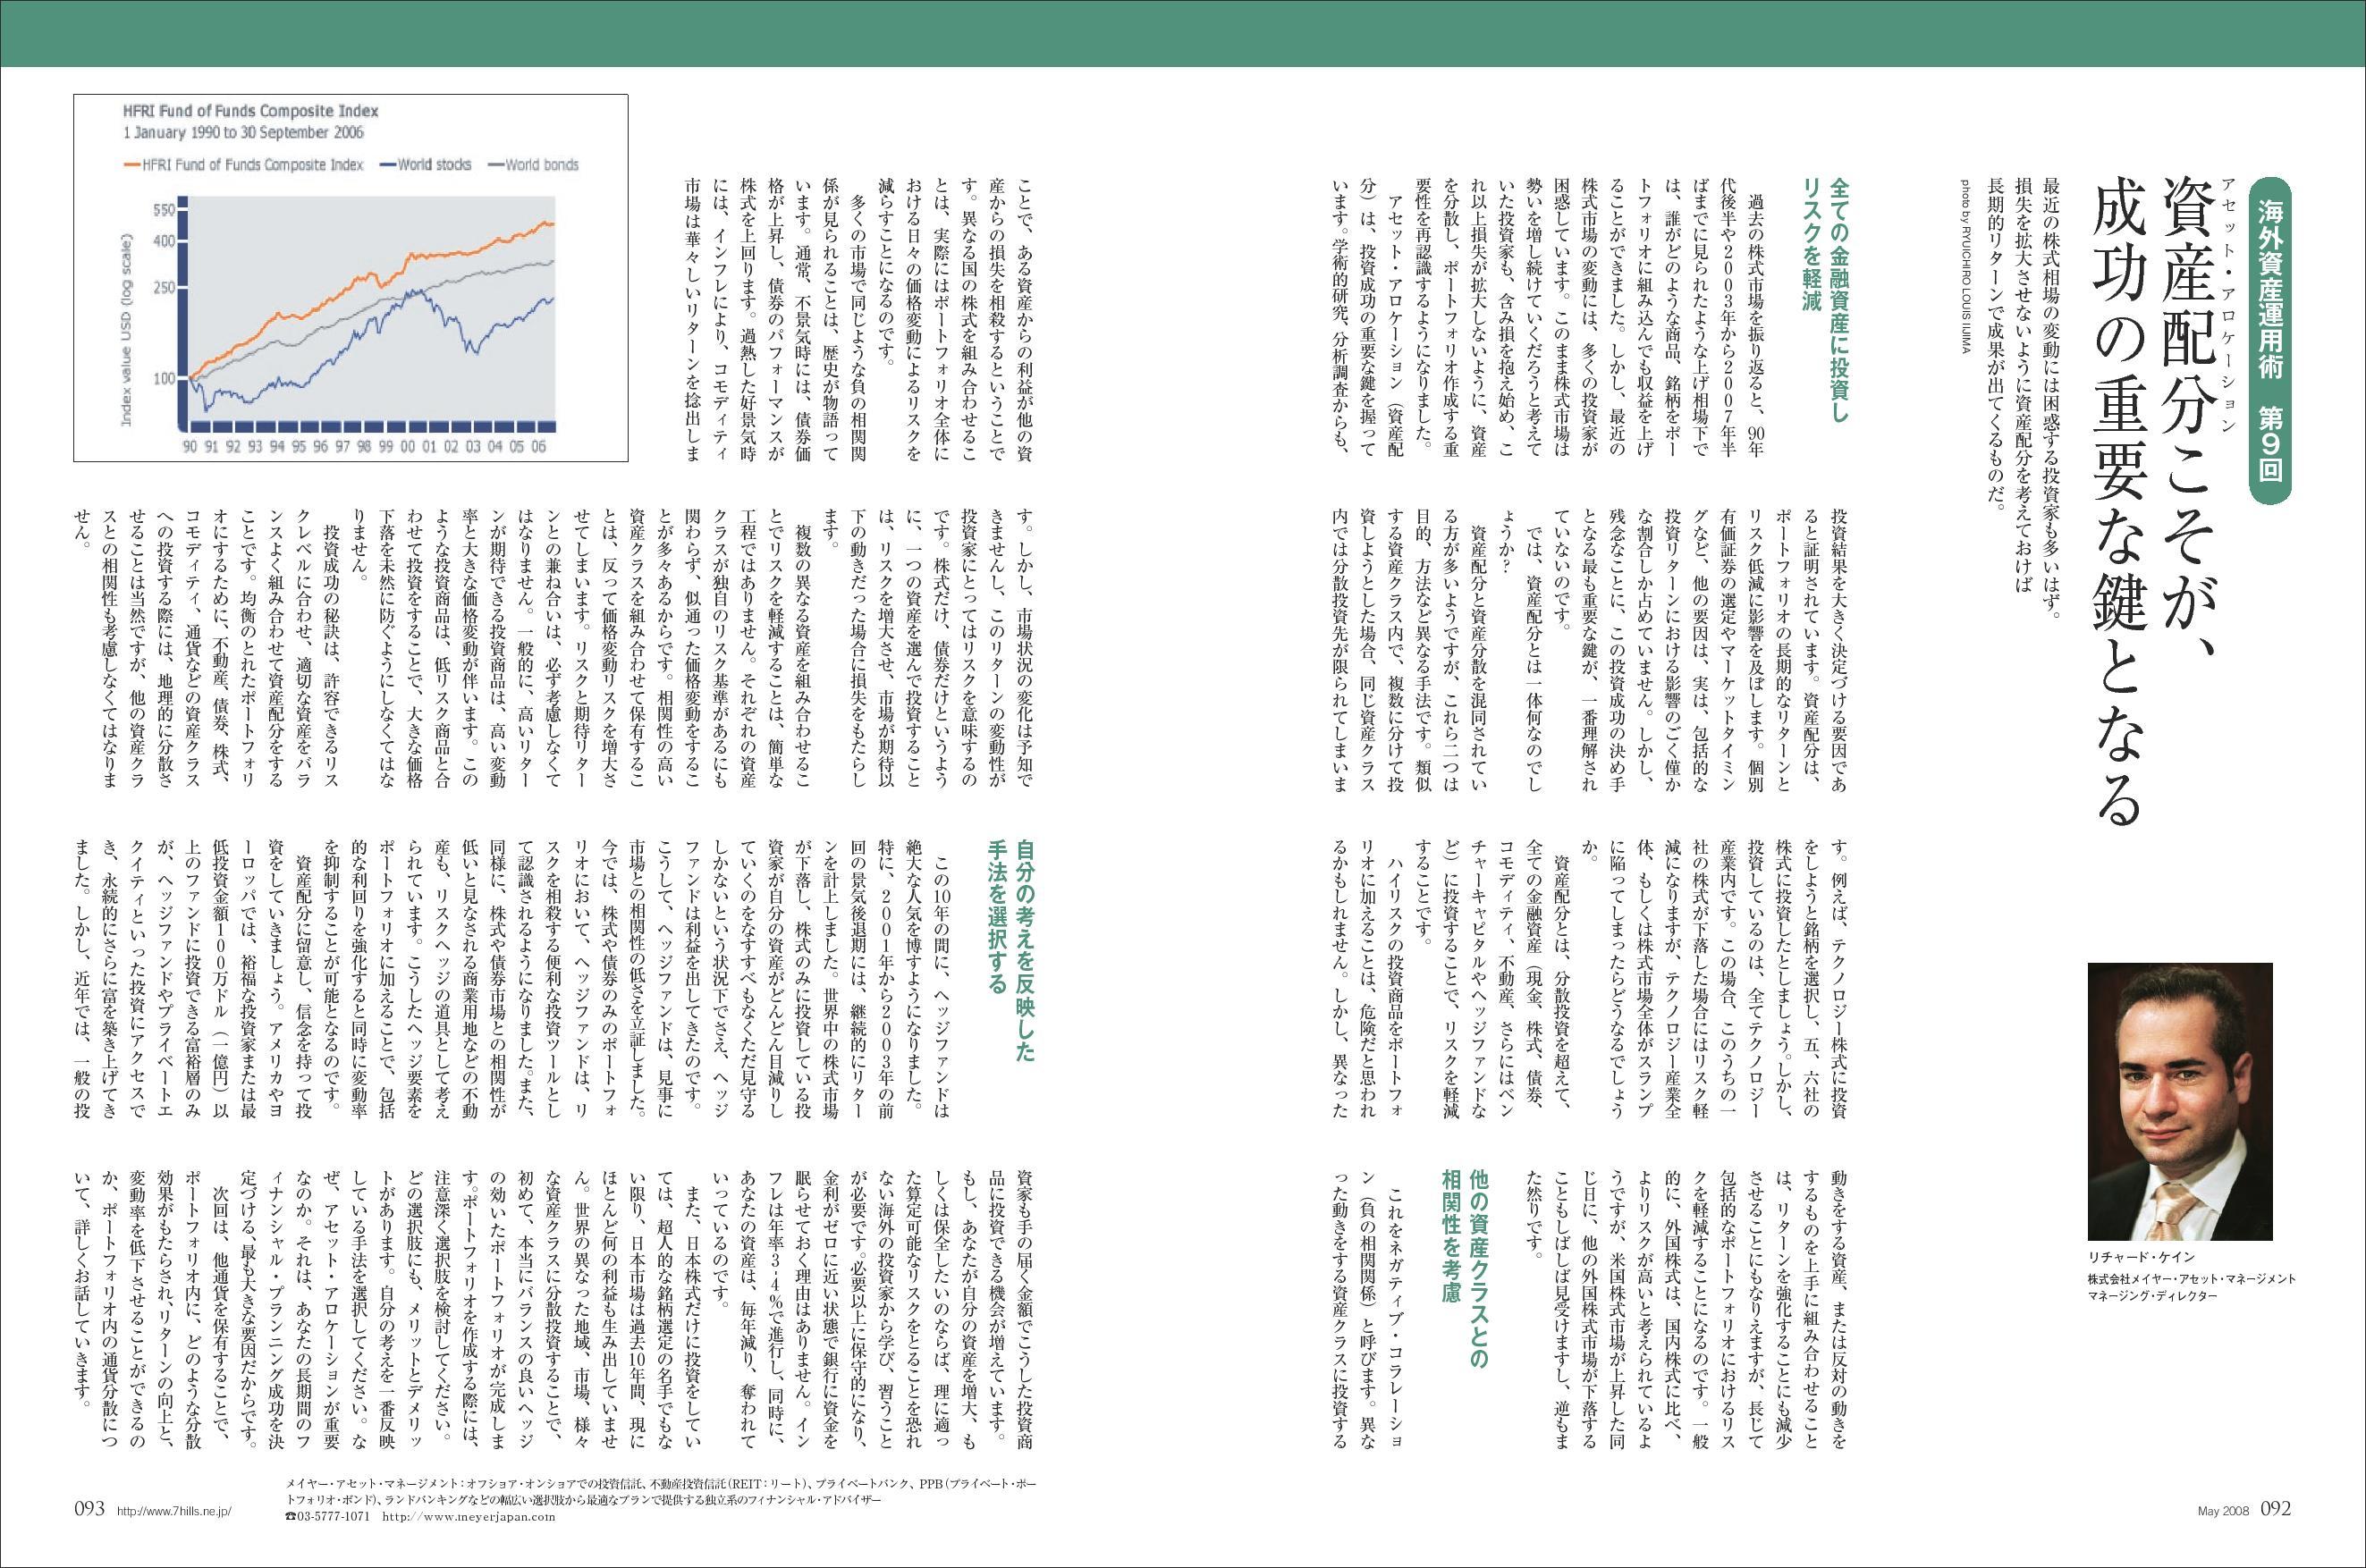 RICHARD CAYNE featured Seven Hills Japan Asset Allocation